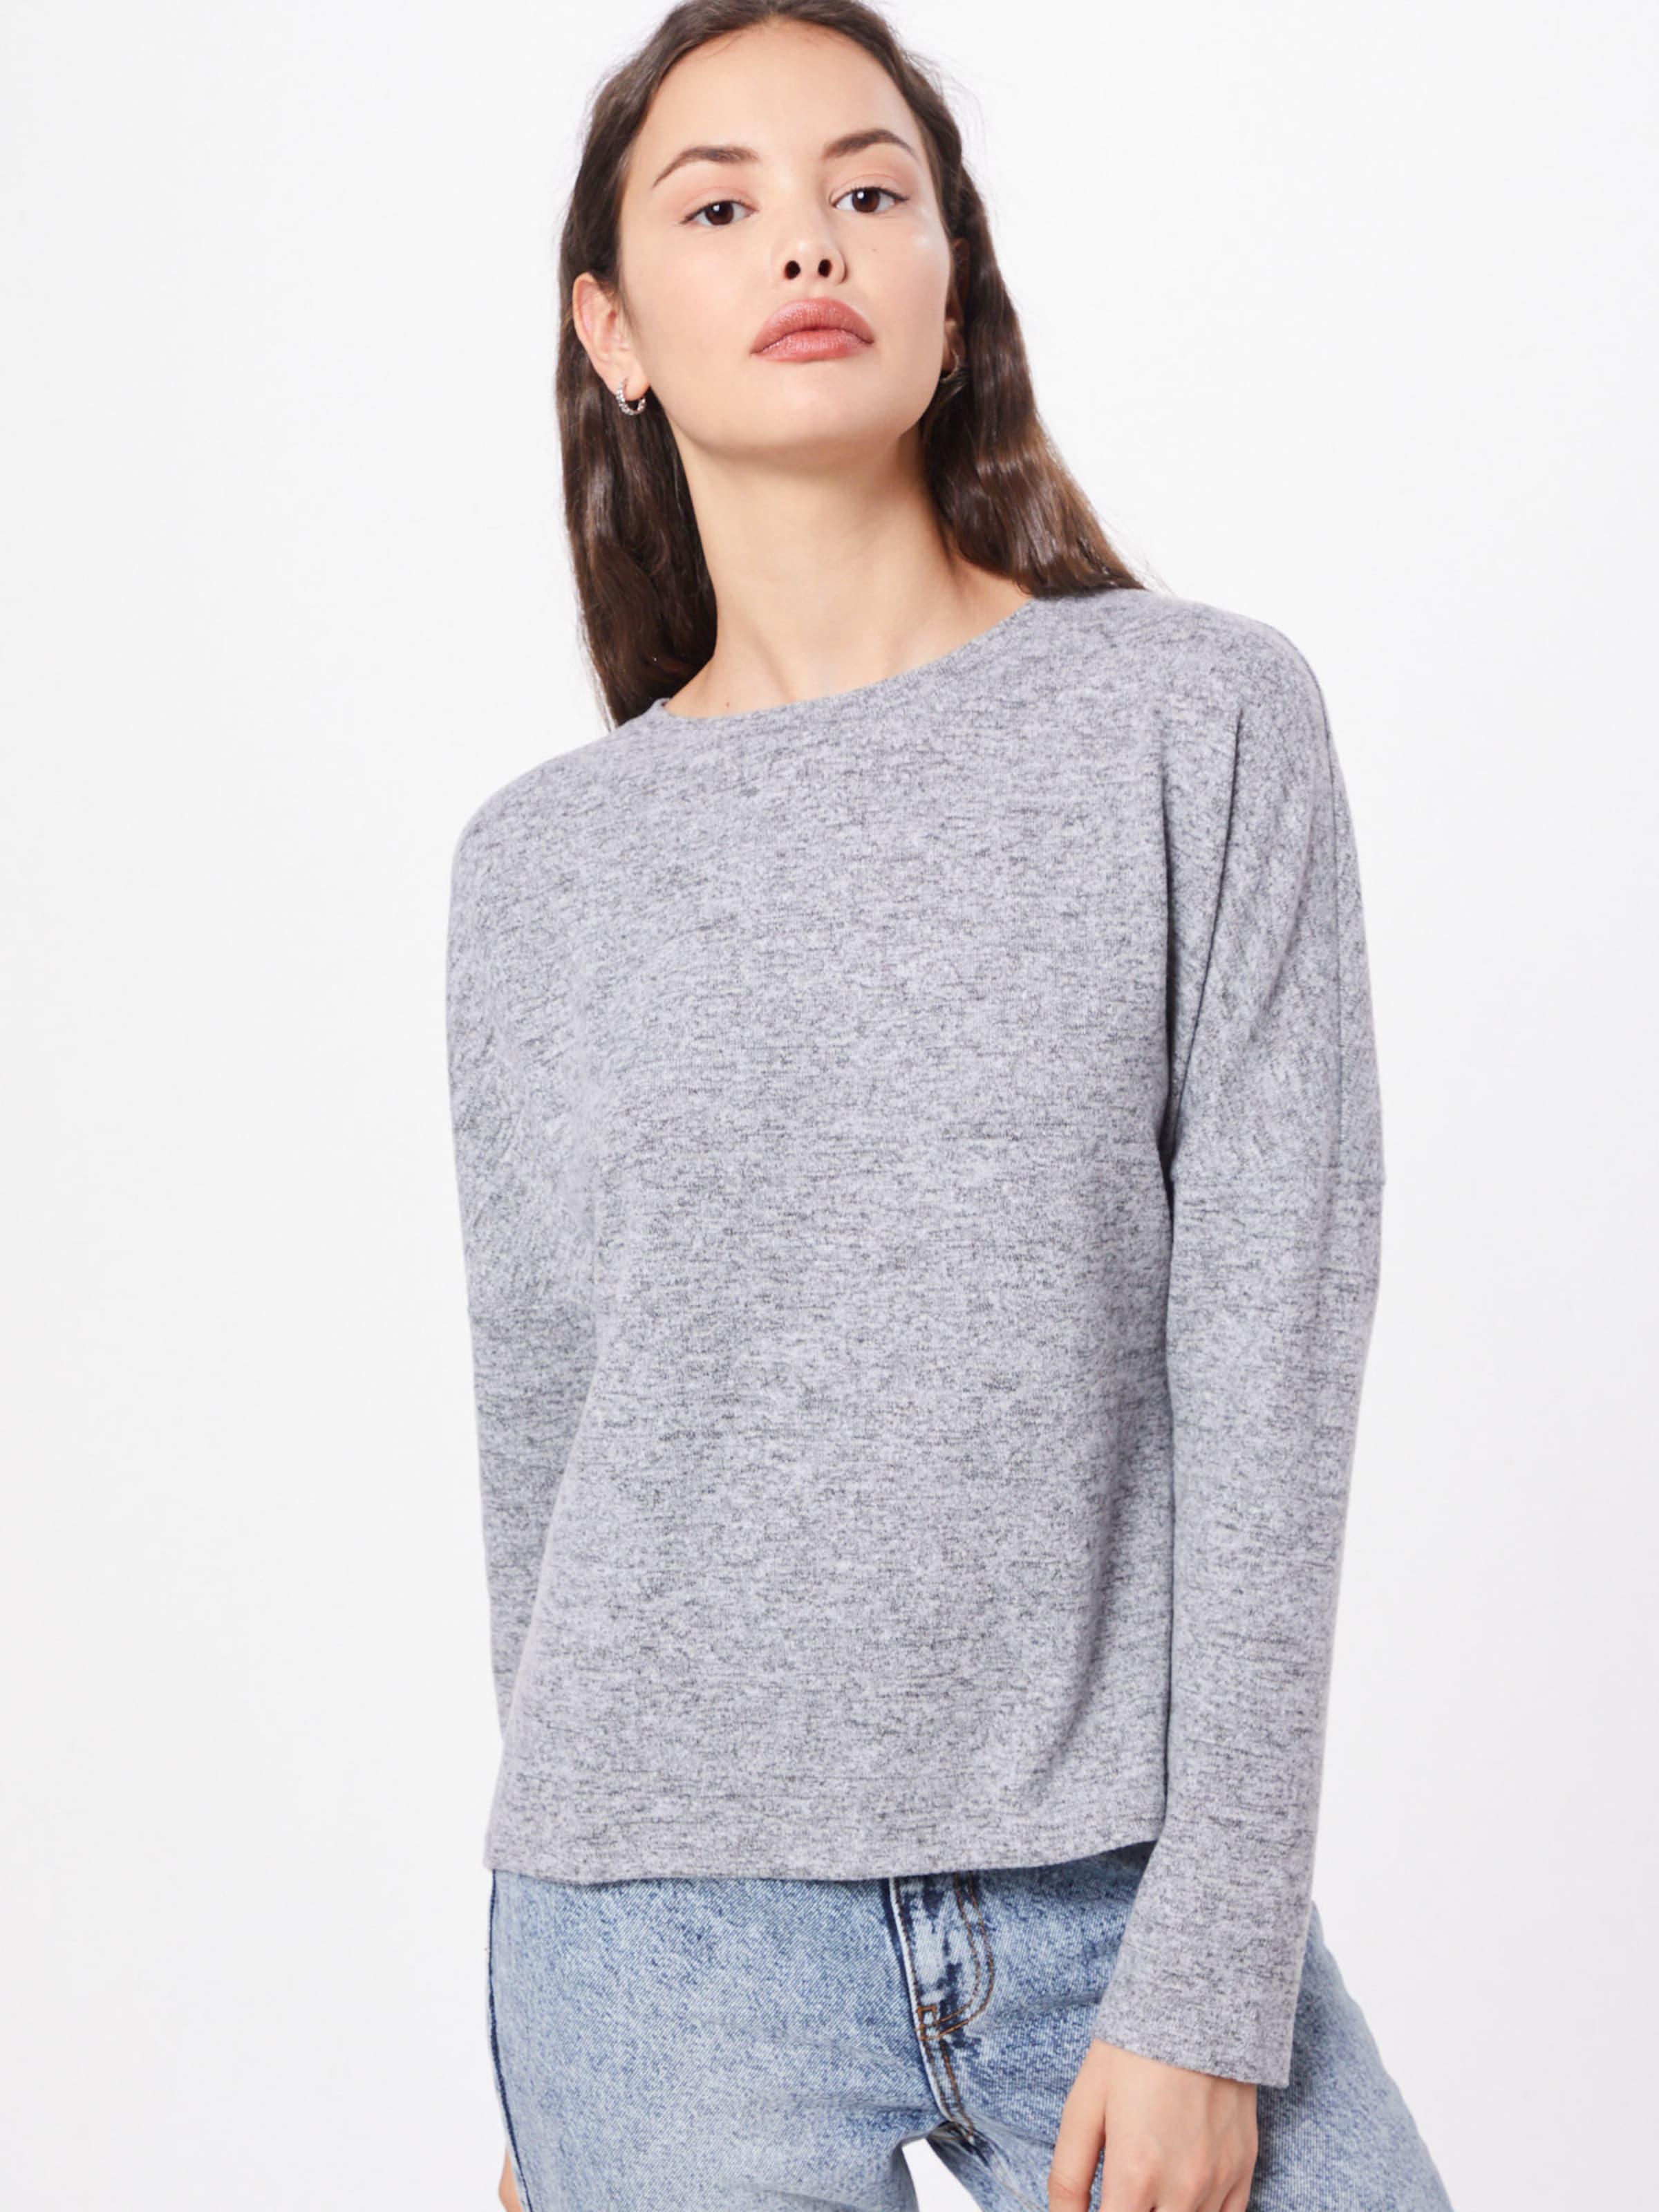 En De shirt Jacqueline 'asta Treats' Gris ClairChiné Yong Oversize T fybY7g6